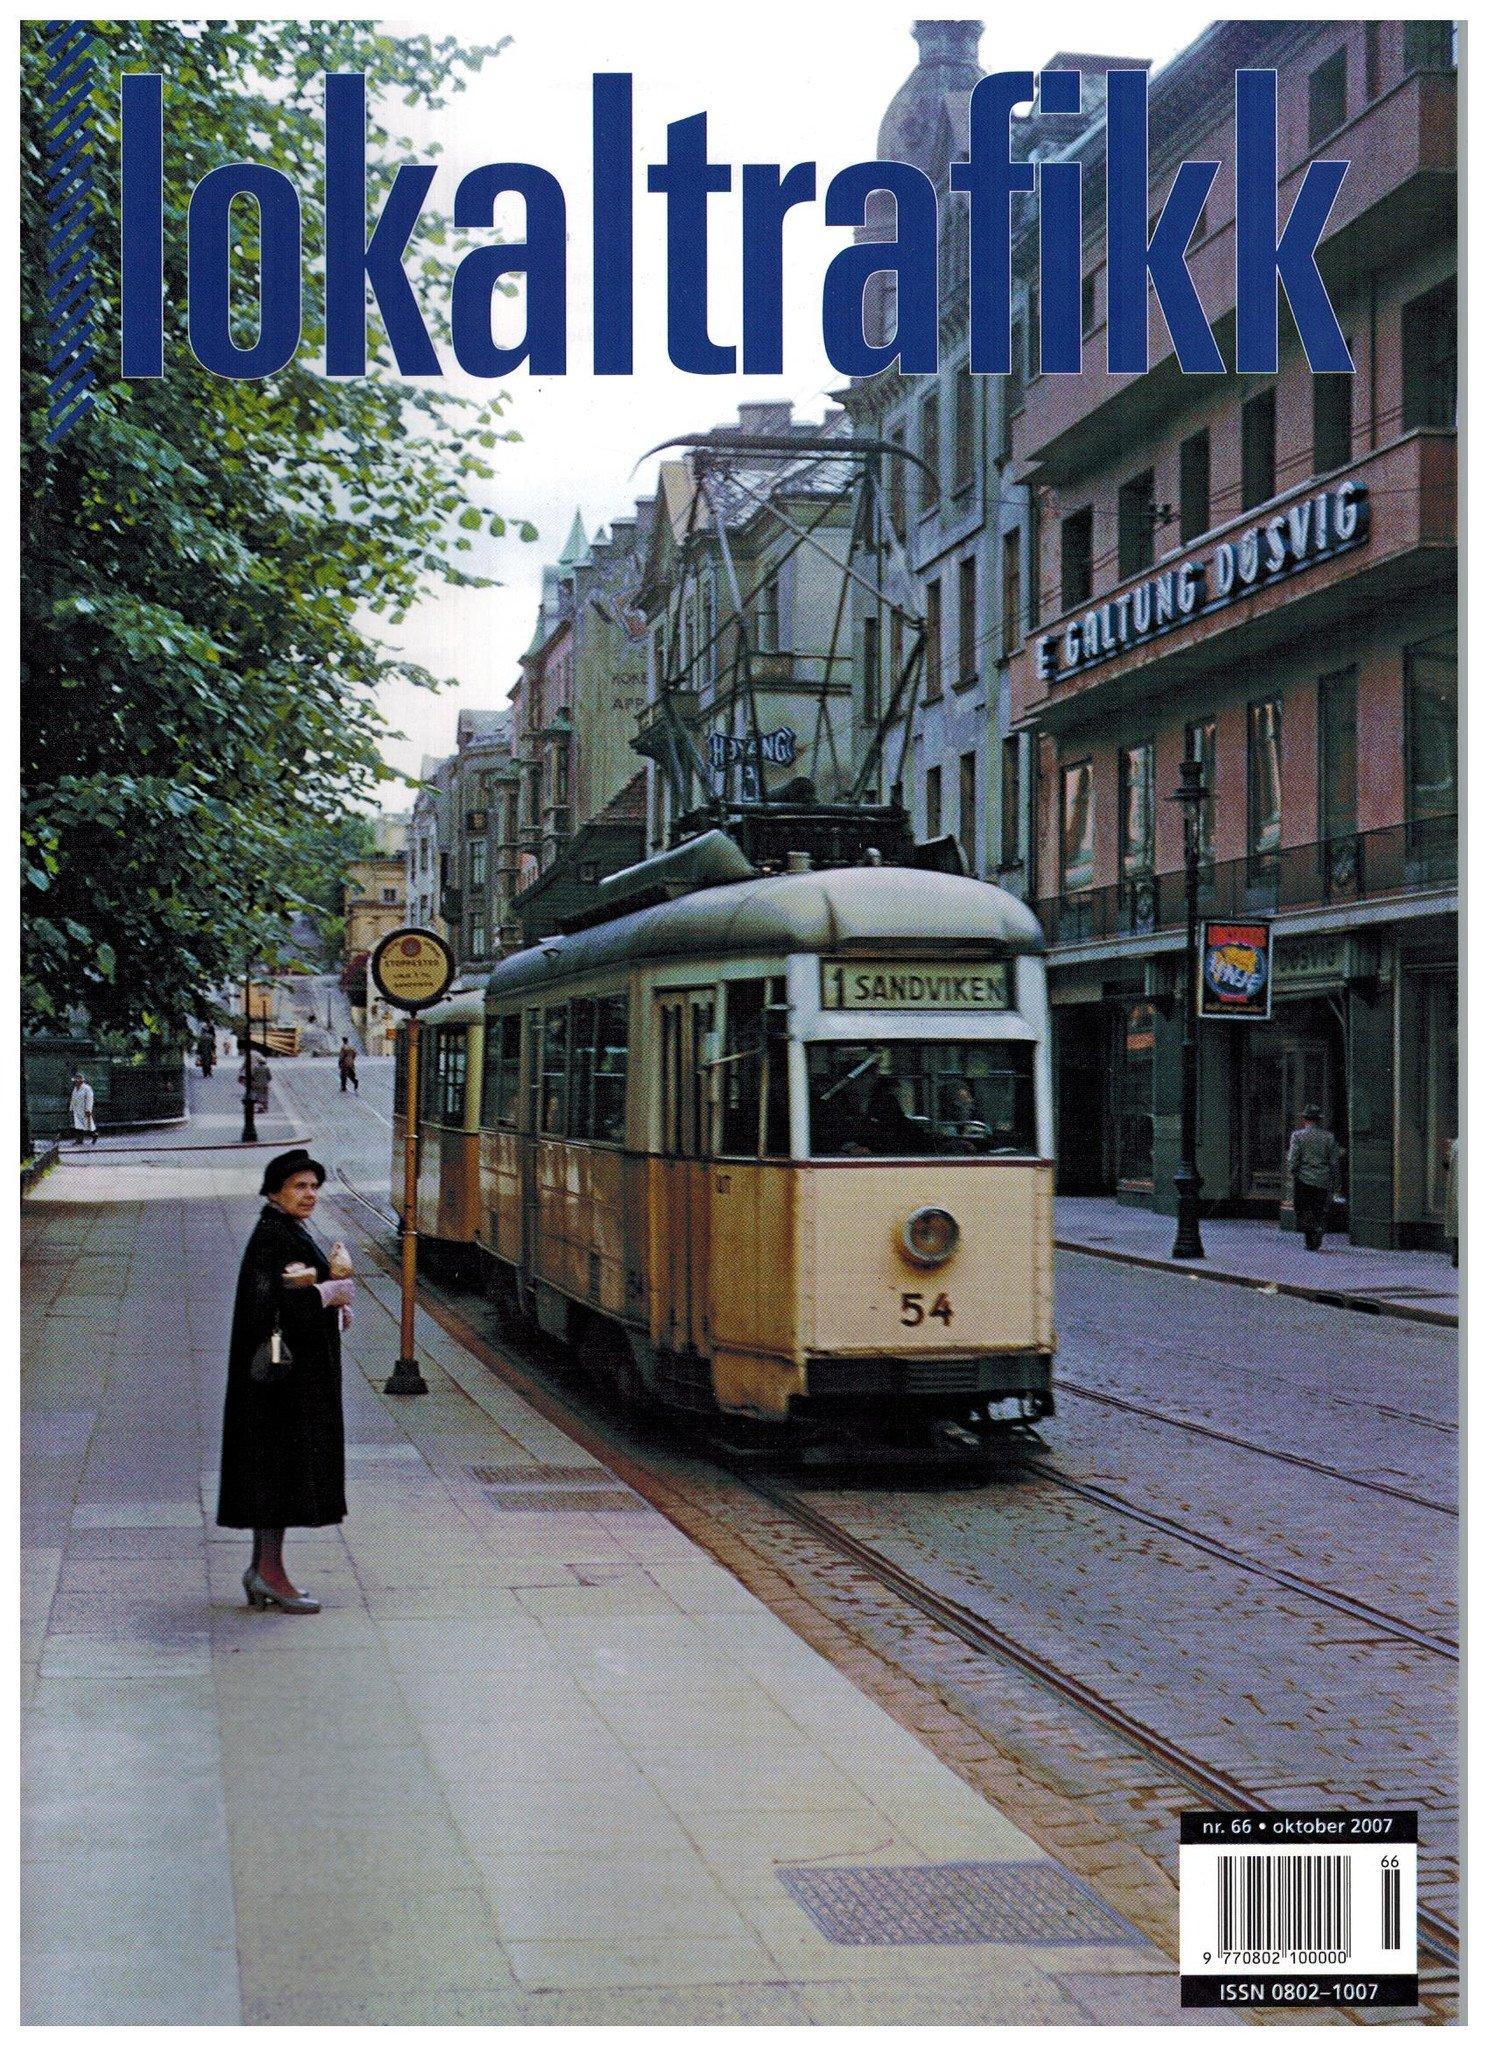 Lokaltrafikk #066